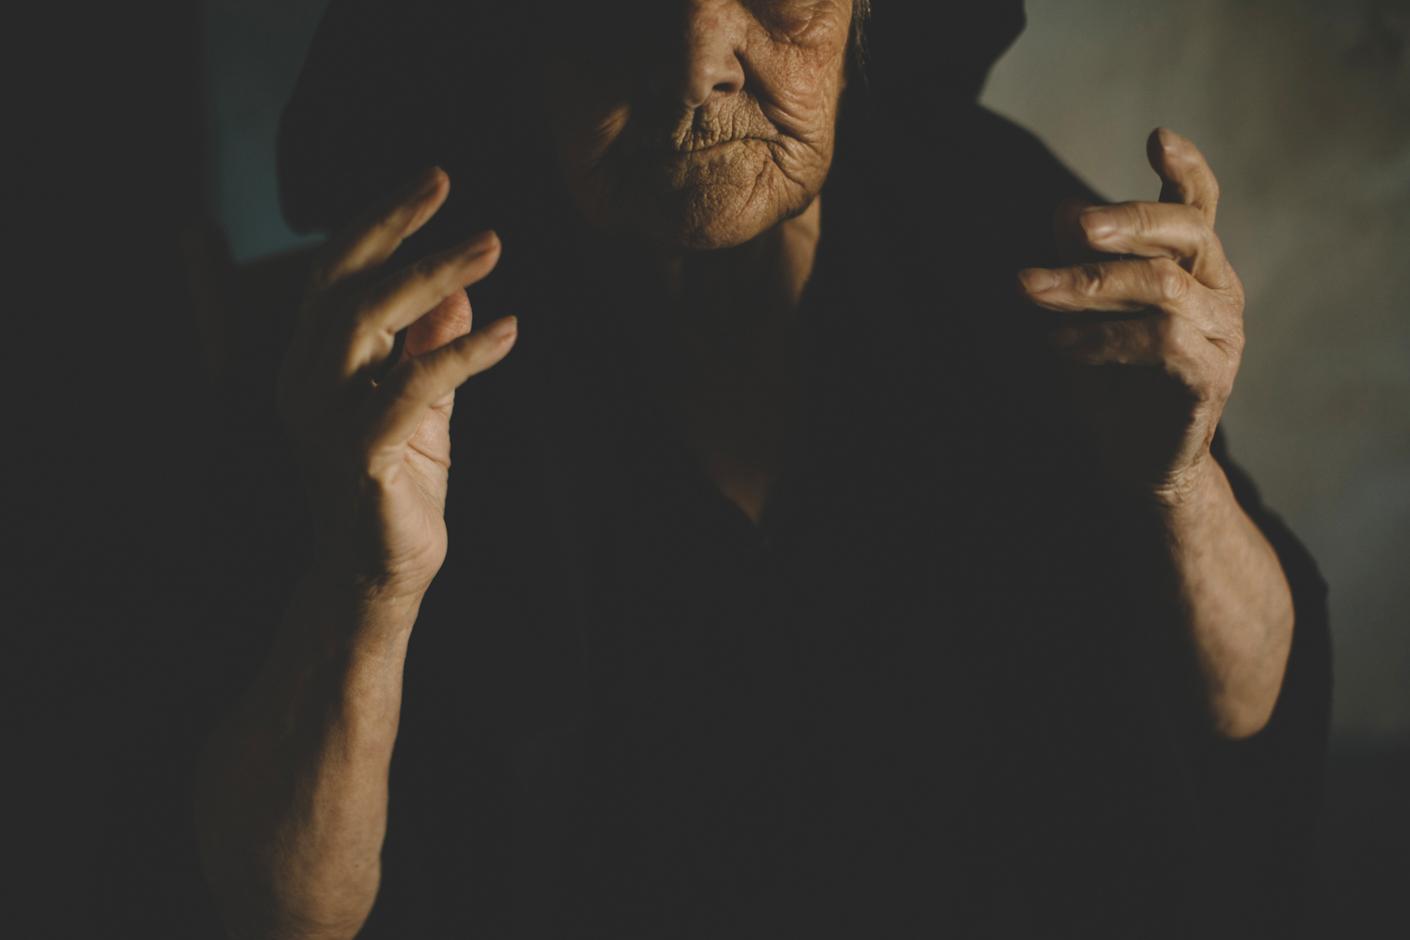 Zia Badora Piredda